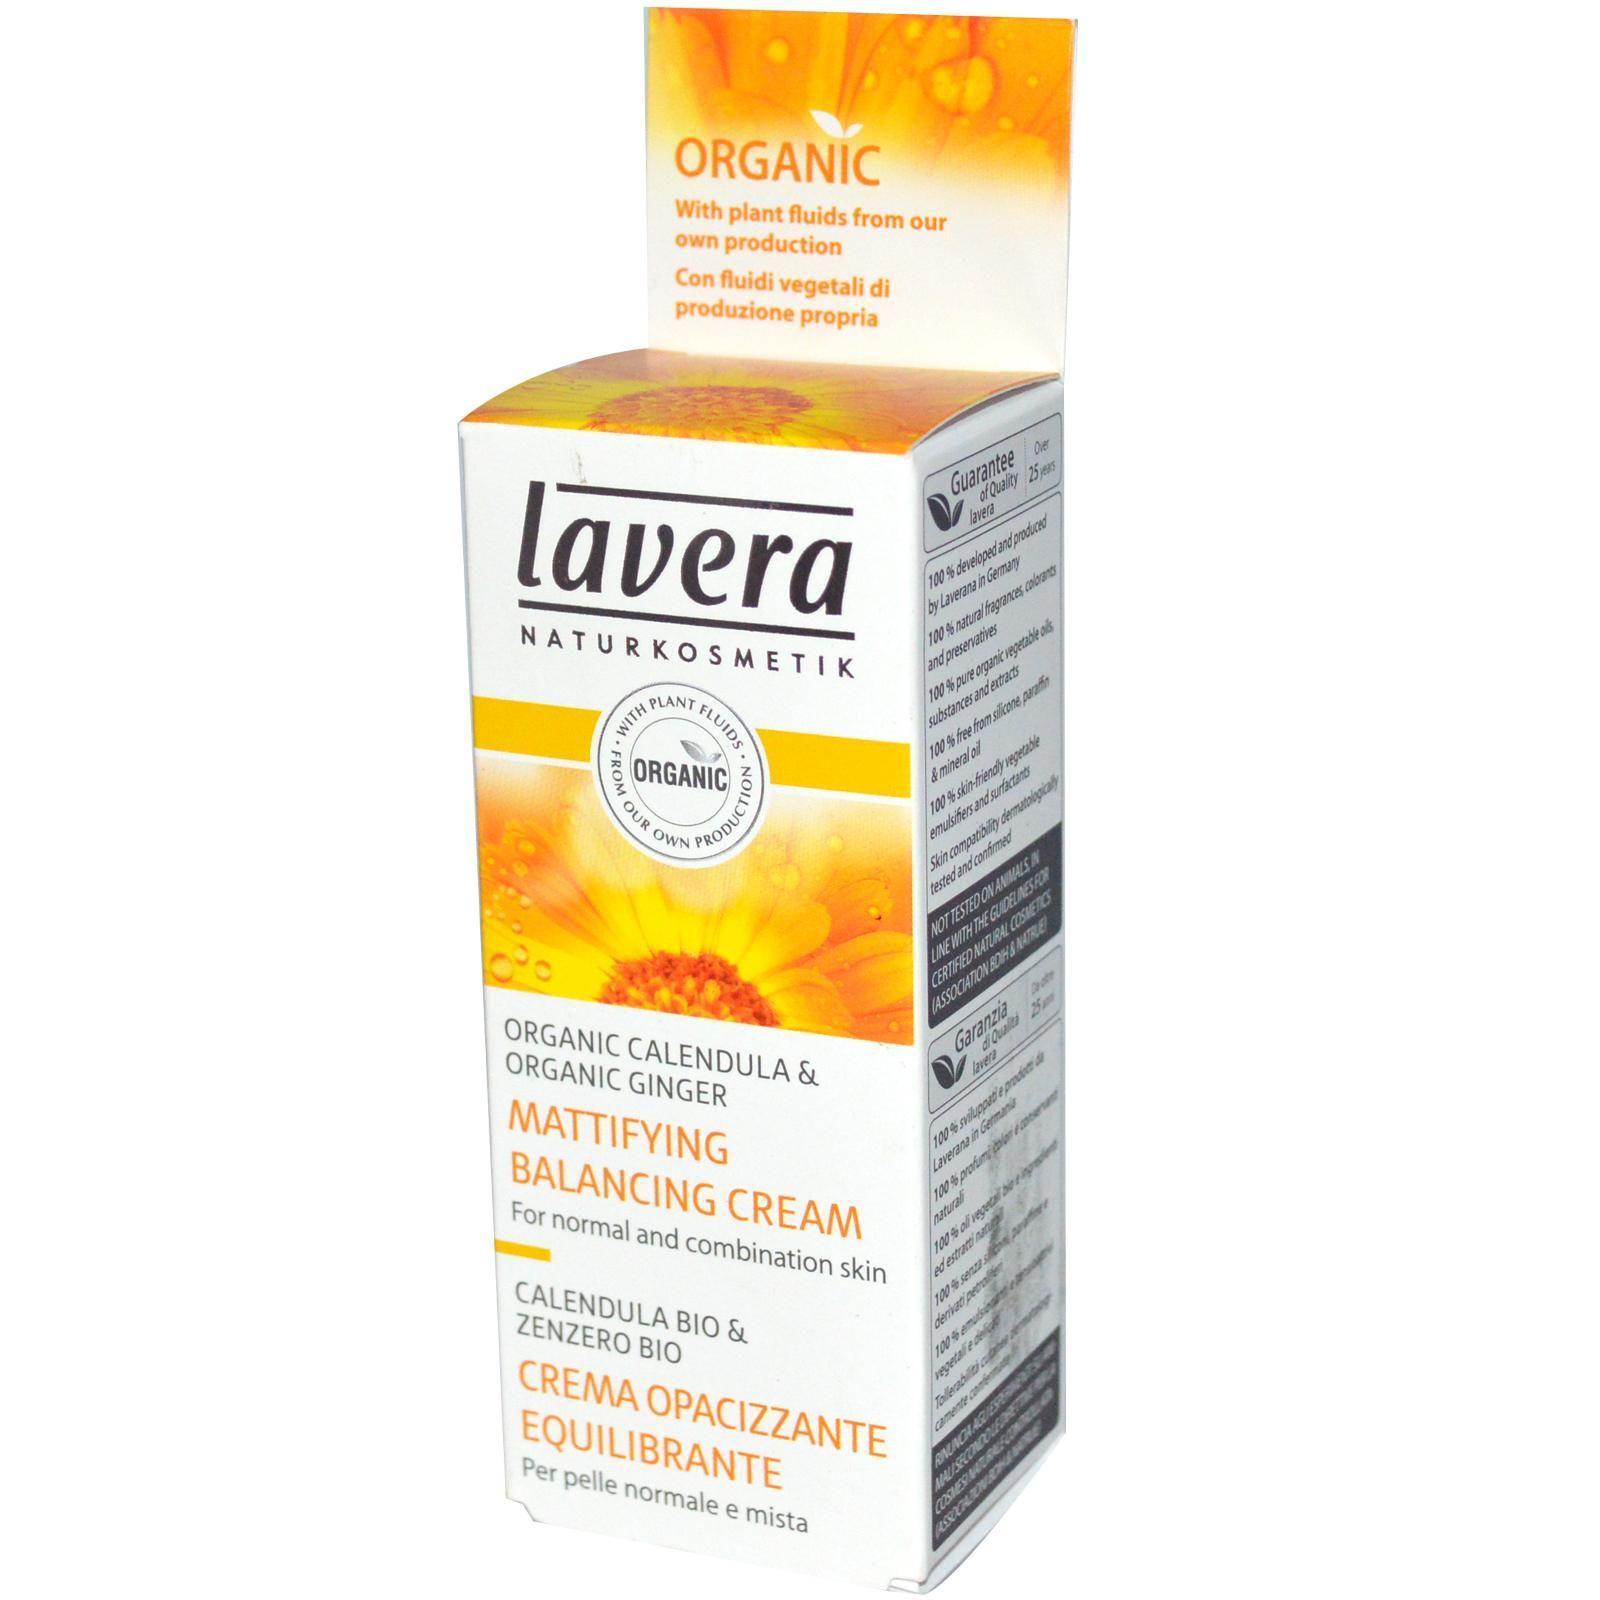 Lavera Naturkosmetic Mattifying Balancing Cream Organic Calendula Calendula Natural Fragrances Natural Cosmetics